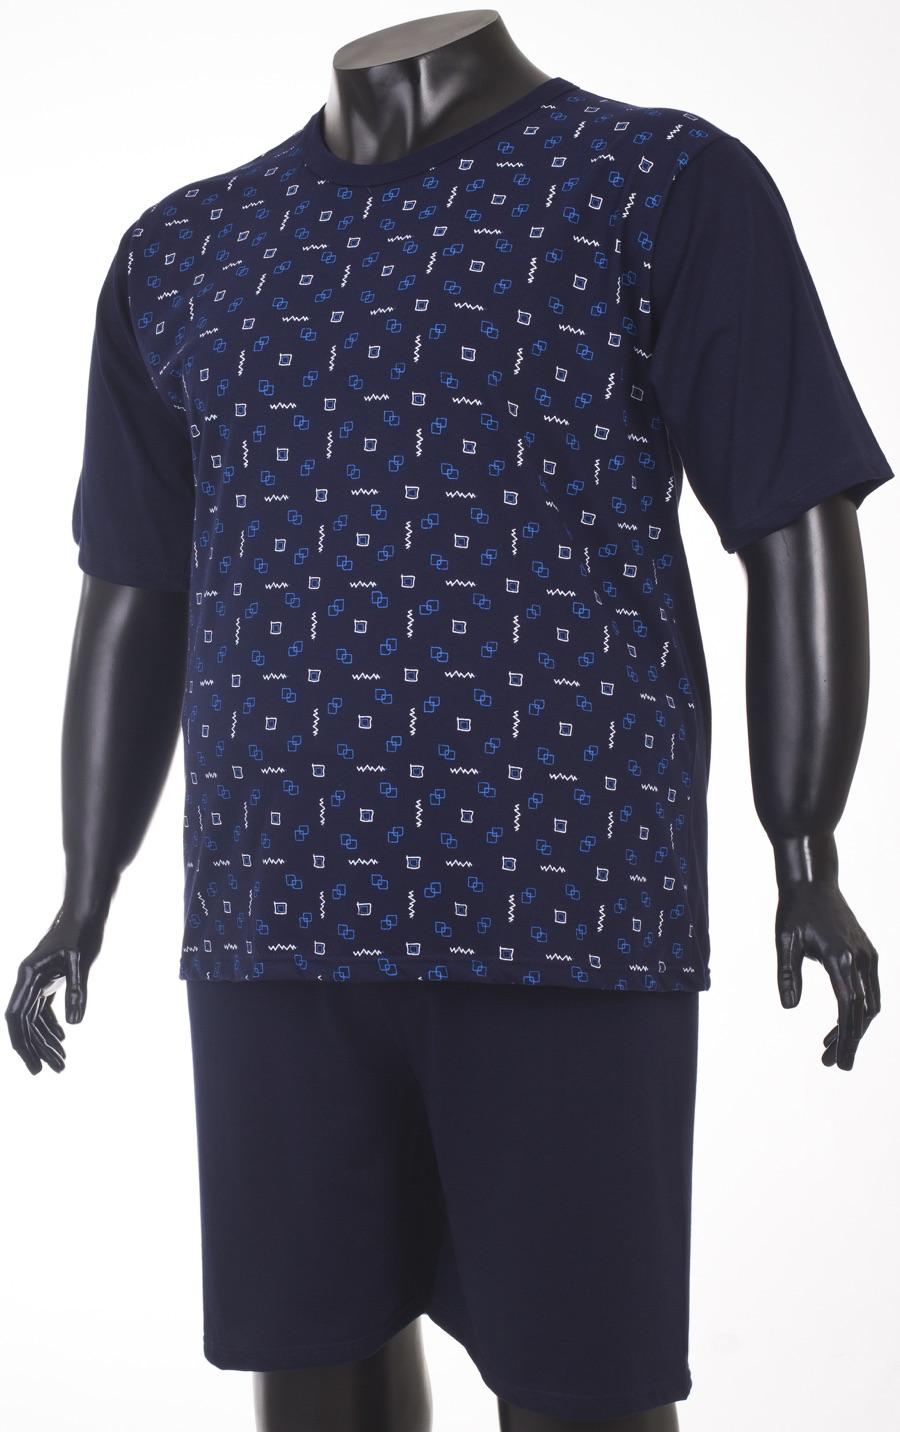 Big Men Certified piżama 3XL 4XL 5XL 6XL 7XL 8XL